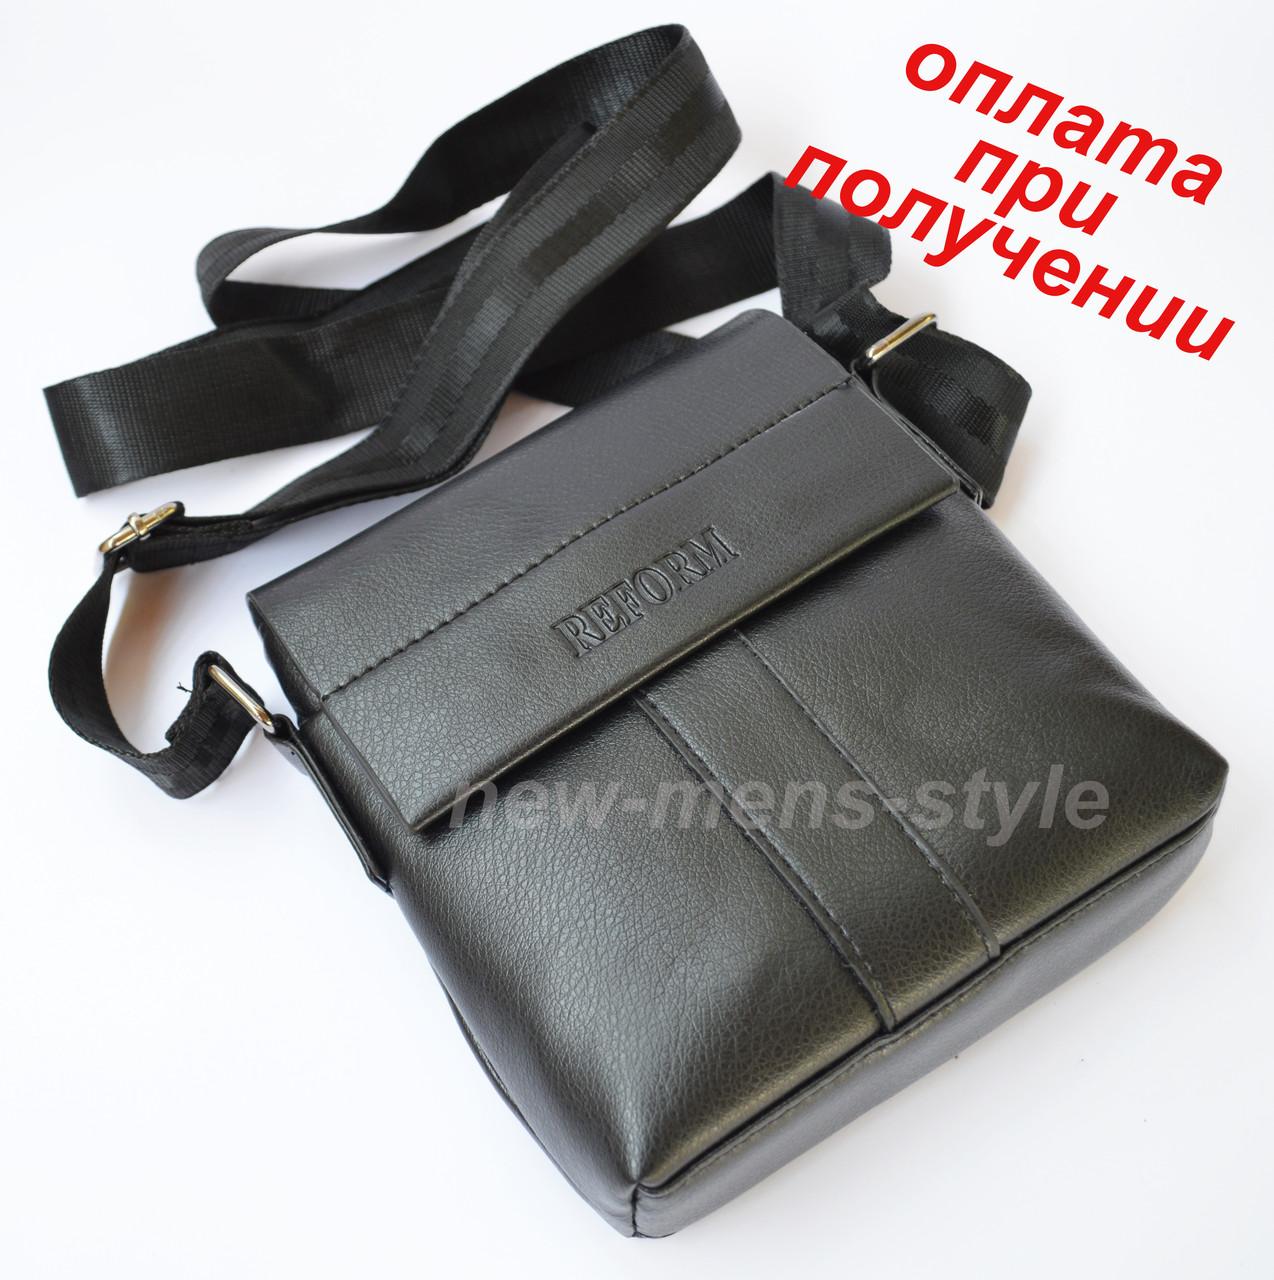 Мужская чоловіча кожаная сумка борсетка через плечо REFORM (Polo) NEW